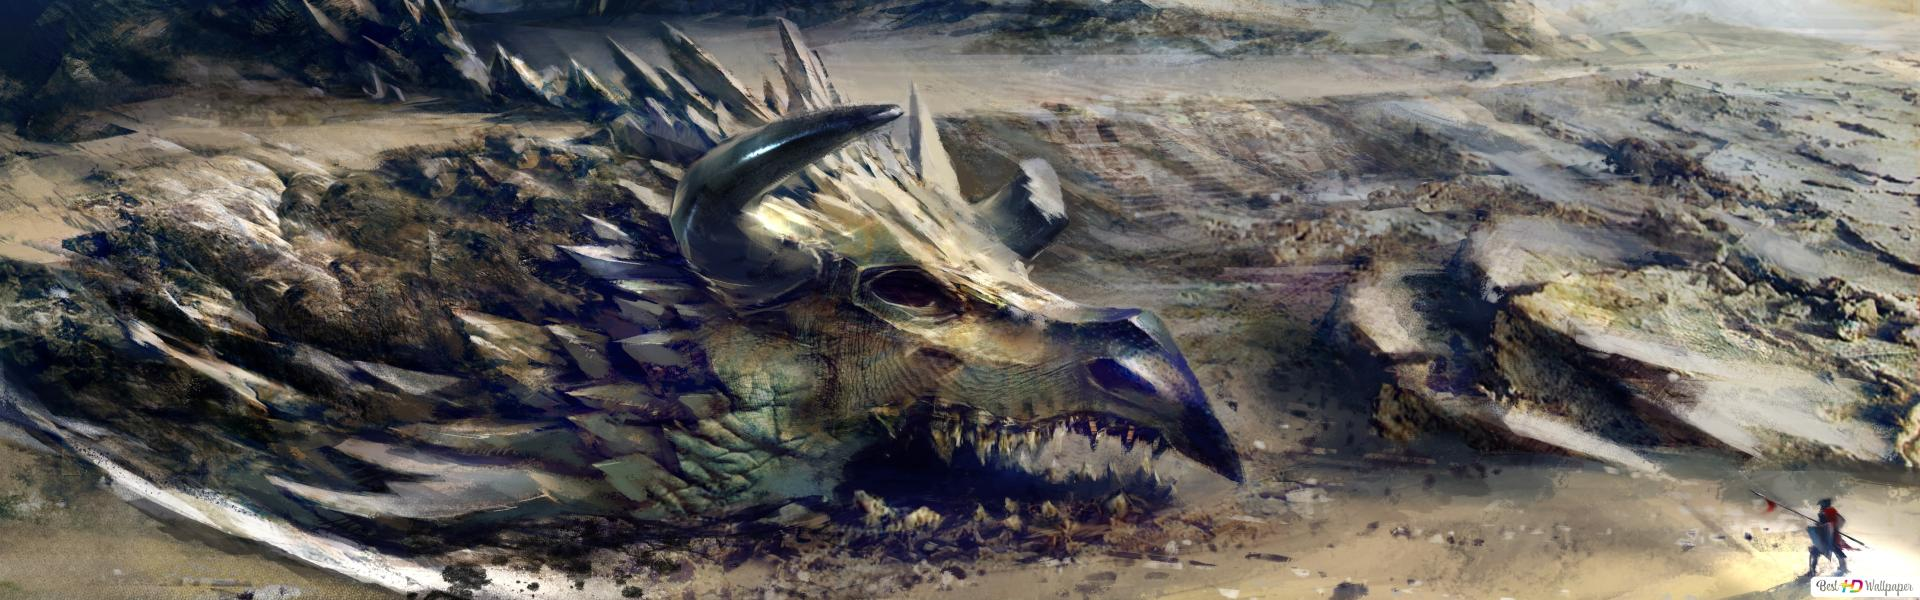 Guild Wars 2 Oyunu Ejderha Boyama Hd Duvar Kagidi Indir